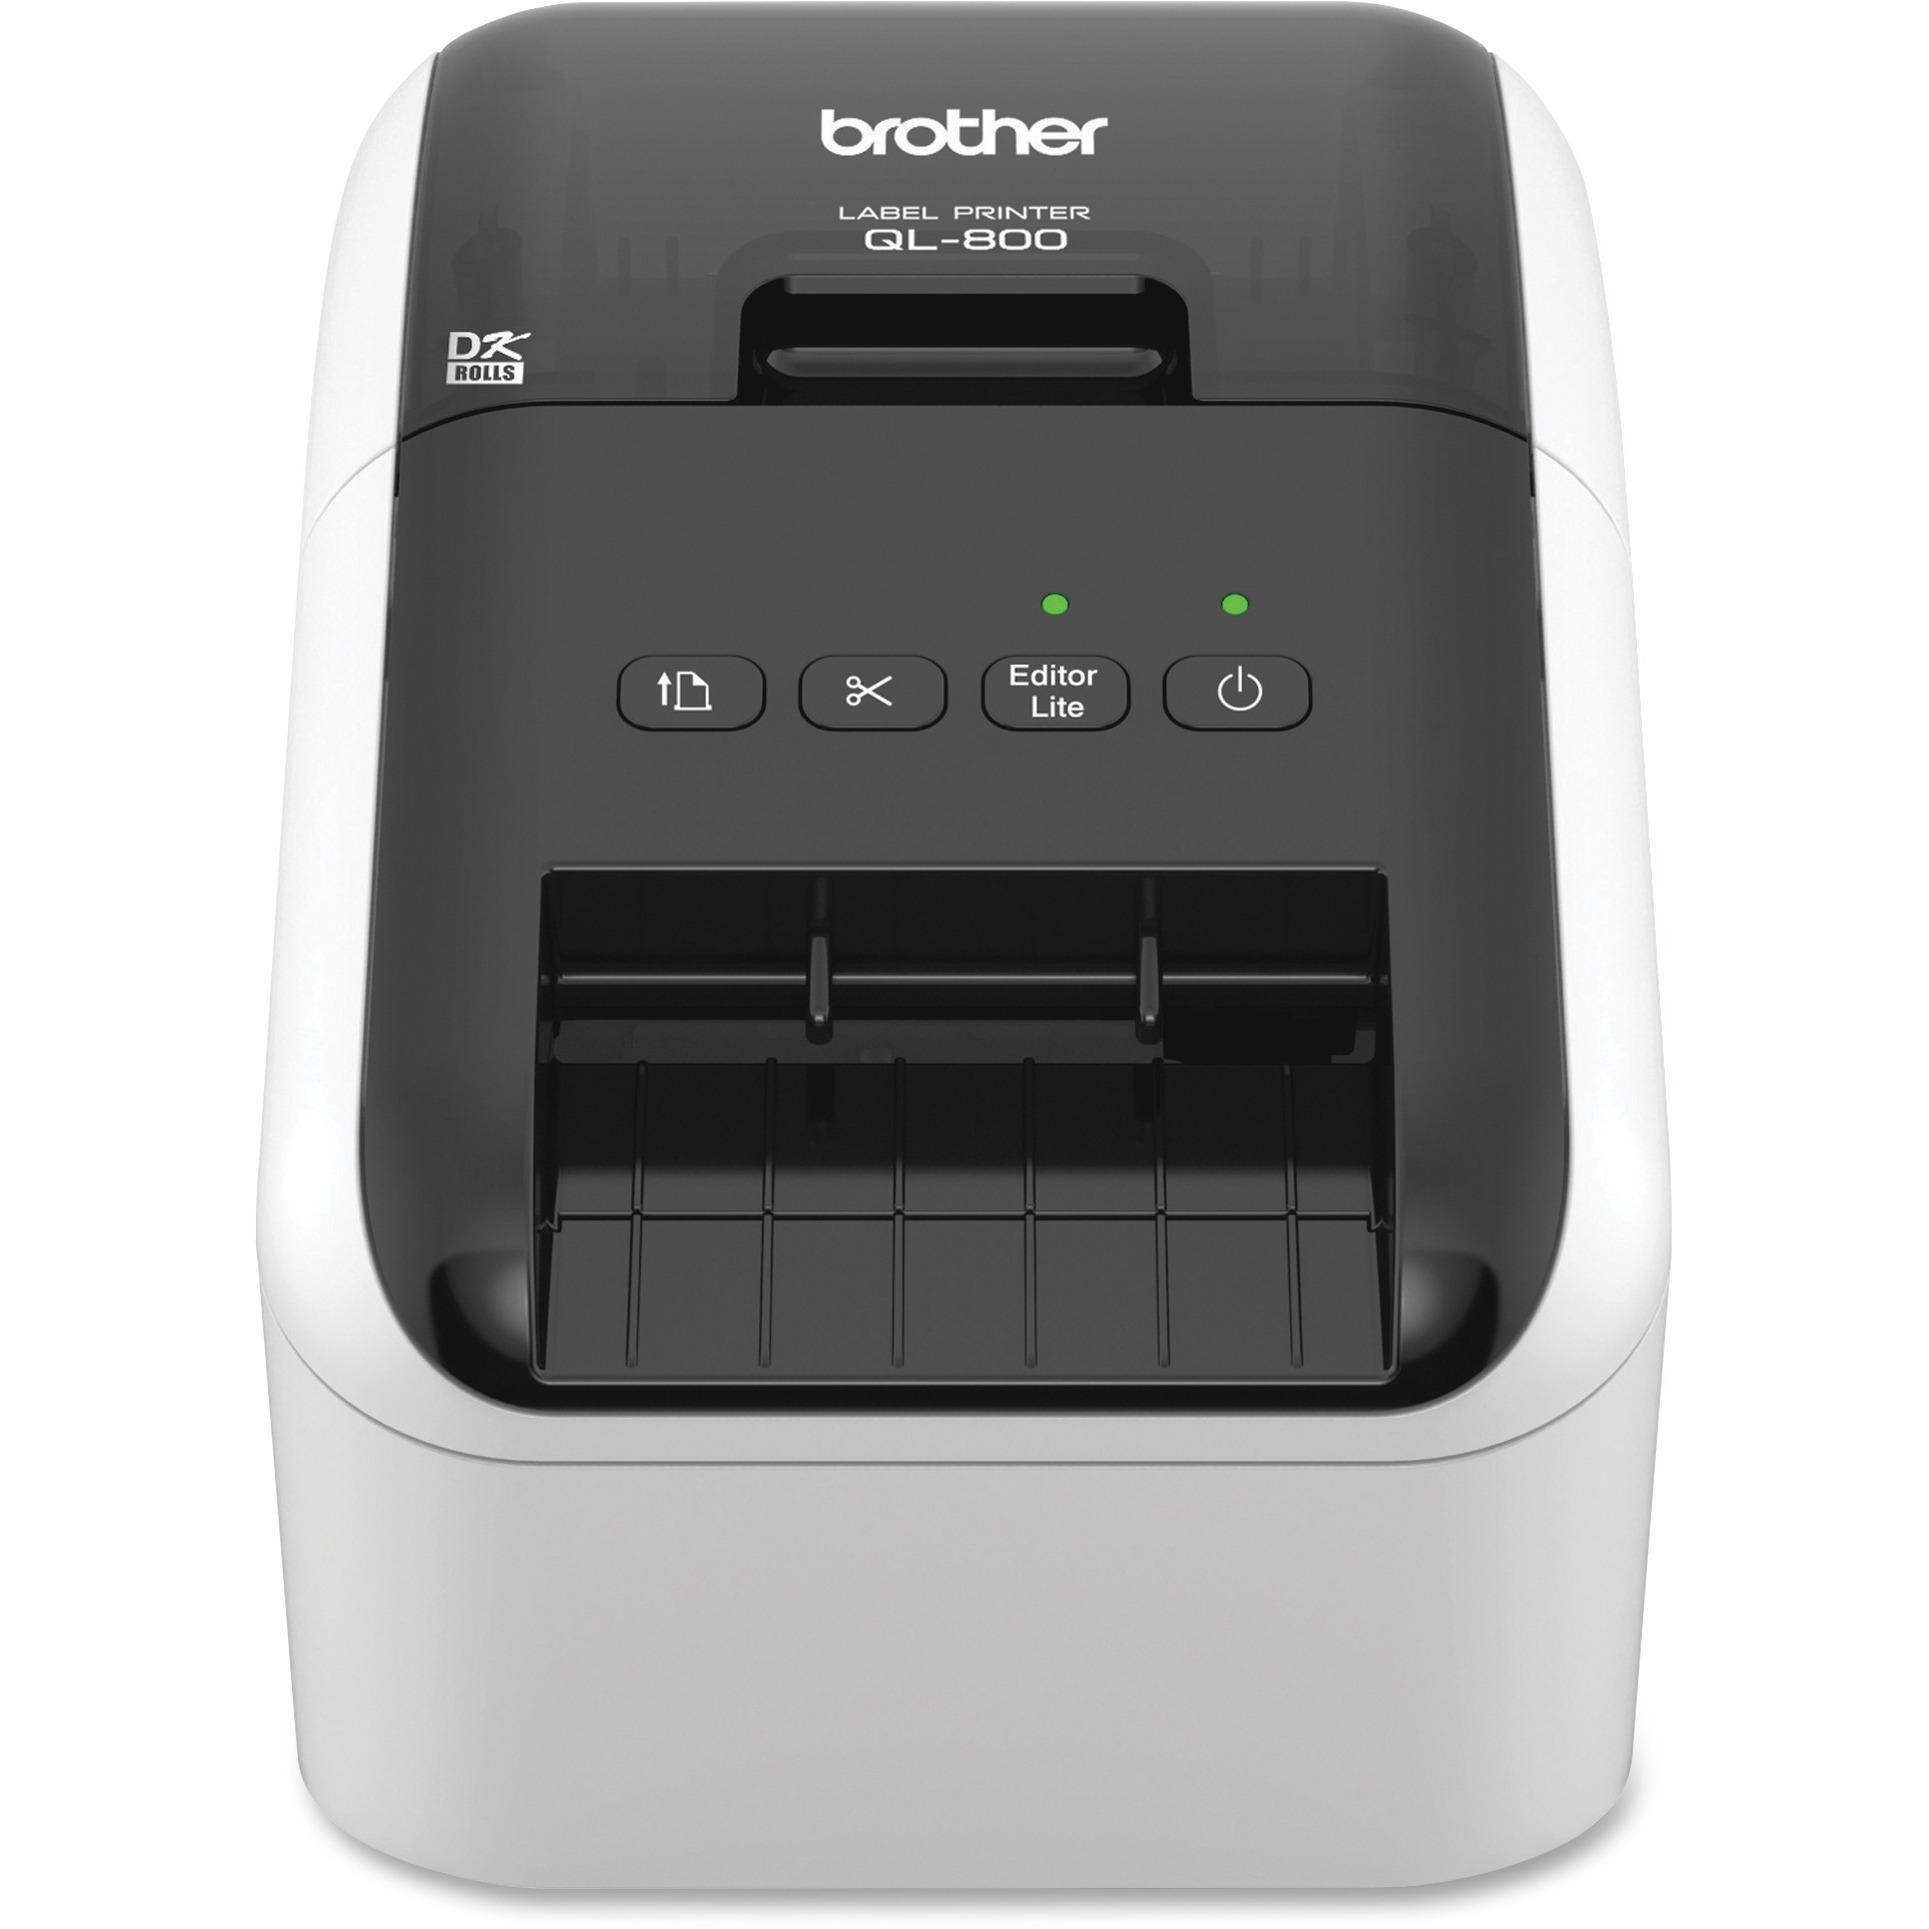 Brother QL-800 Label Printer - Direct Thermal - Monochrome